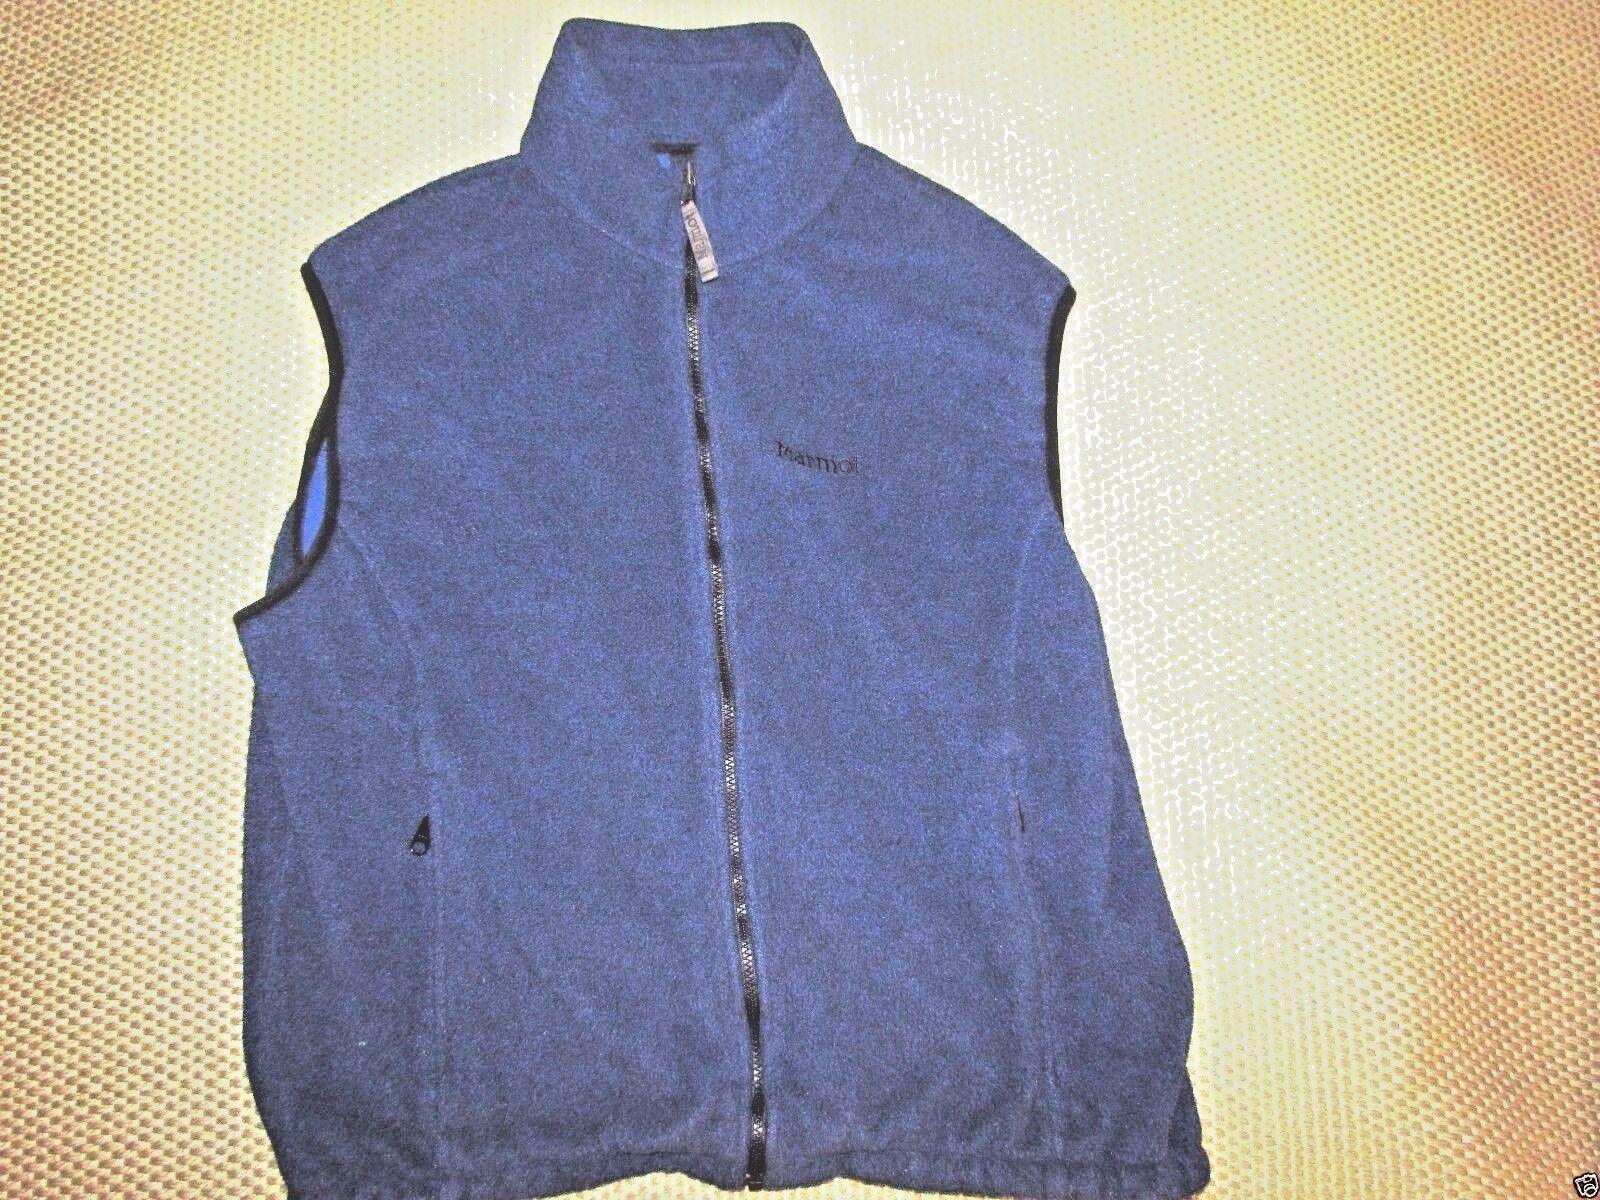 MARMOT - Pile Fleece POLARTEC Men's size Large Vest - bluee in color